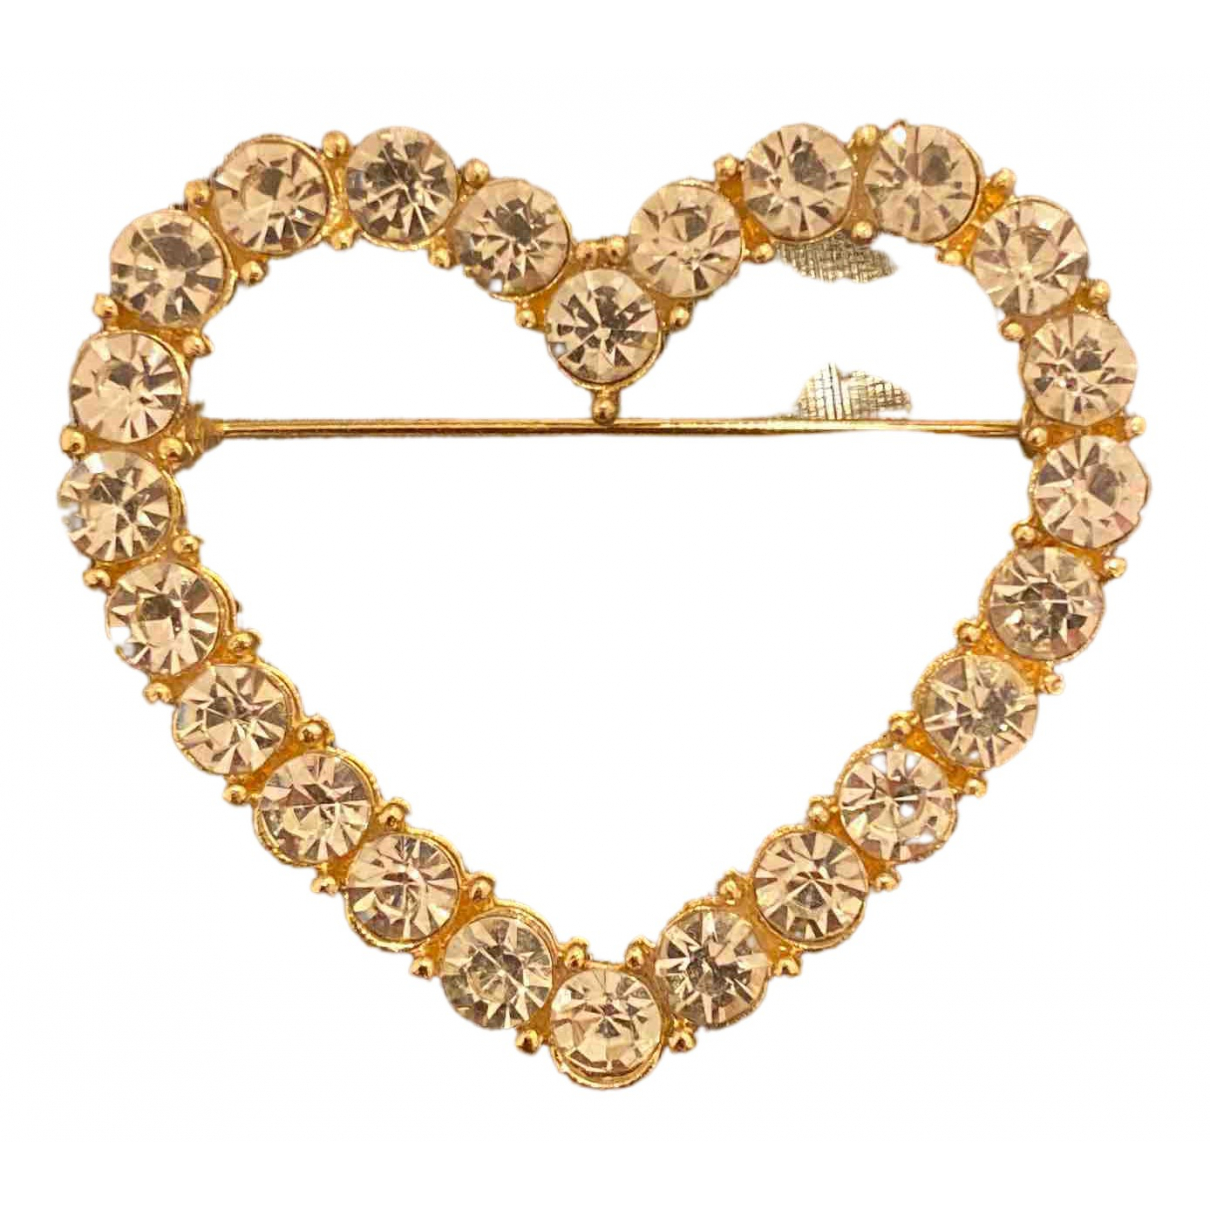 - Broche Motifs Coeurs pour femme en metal - dore